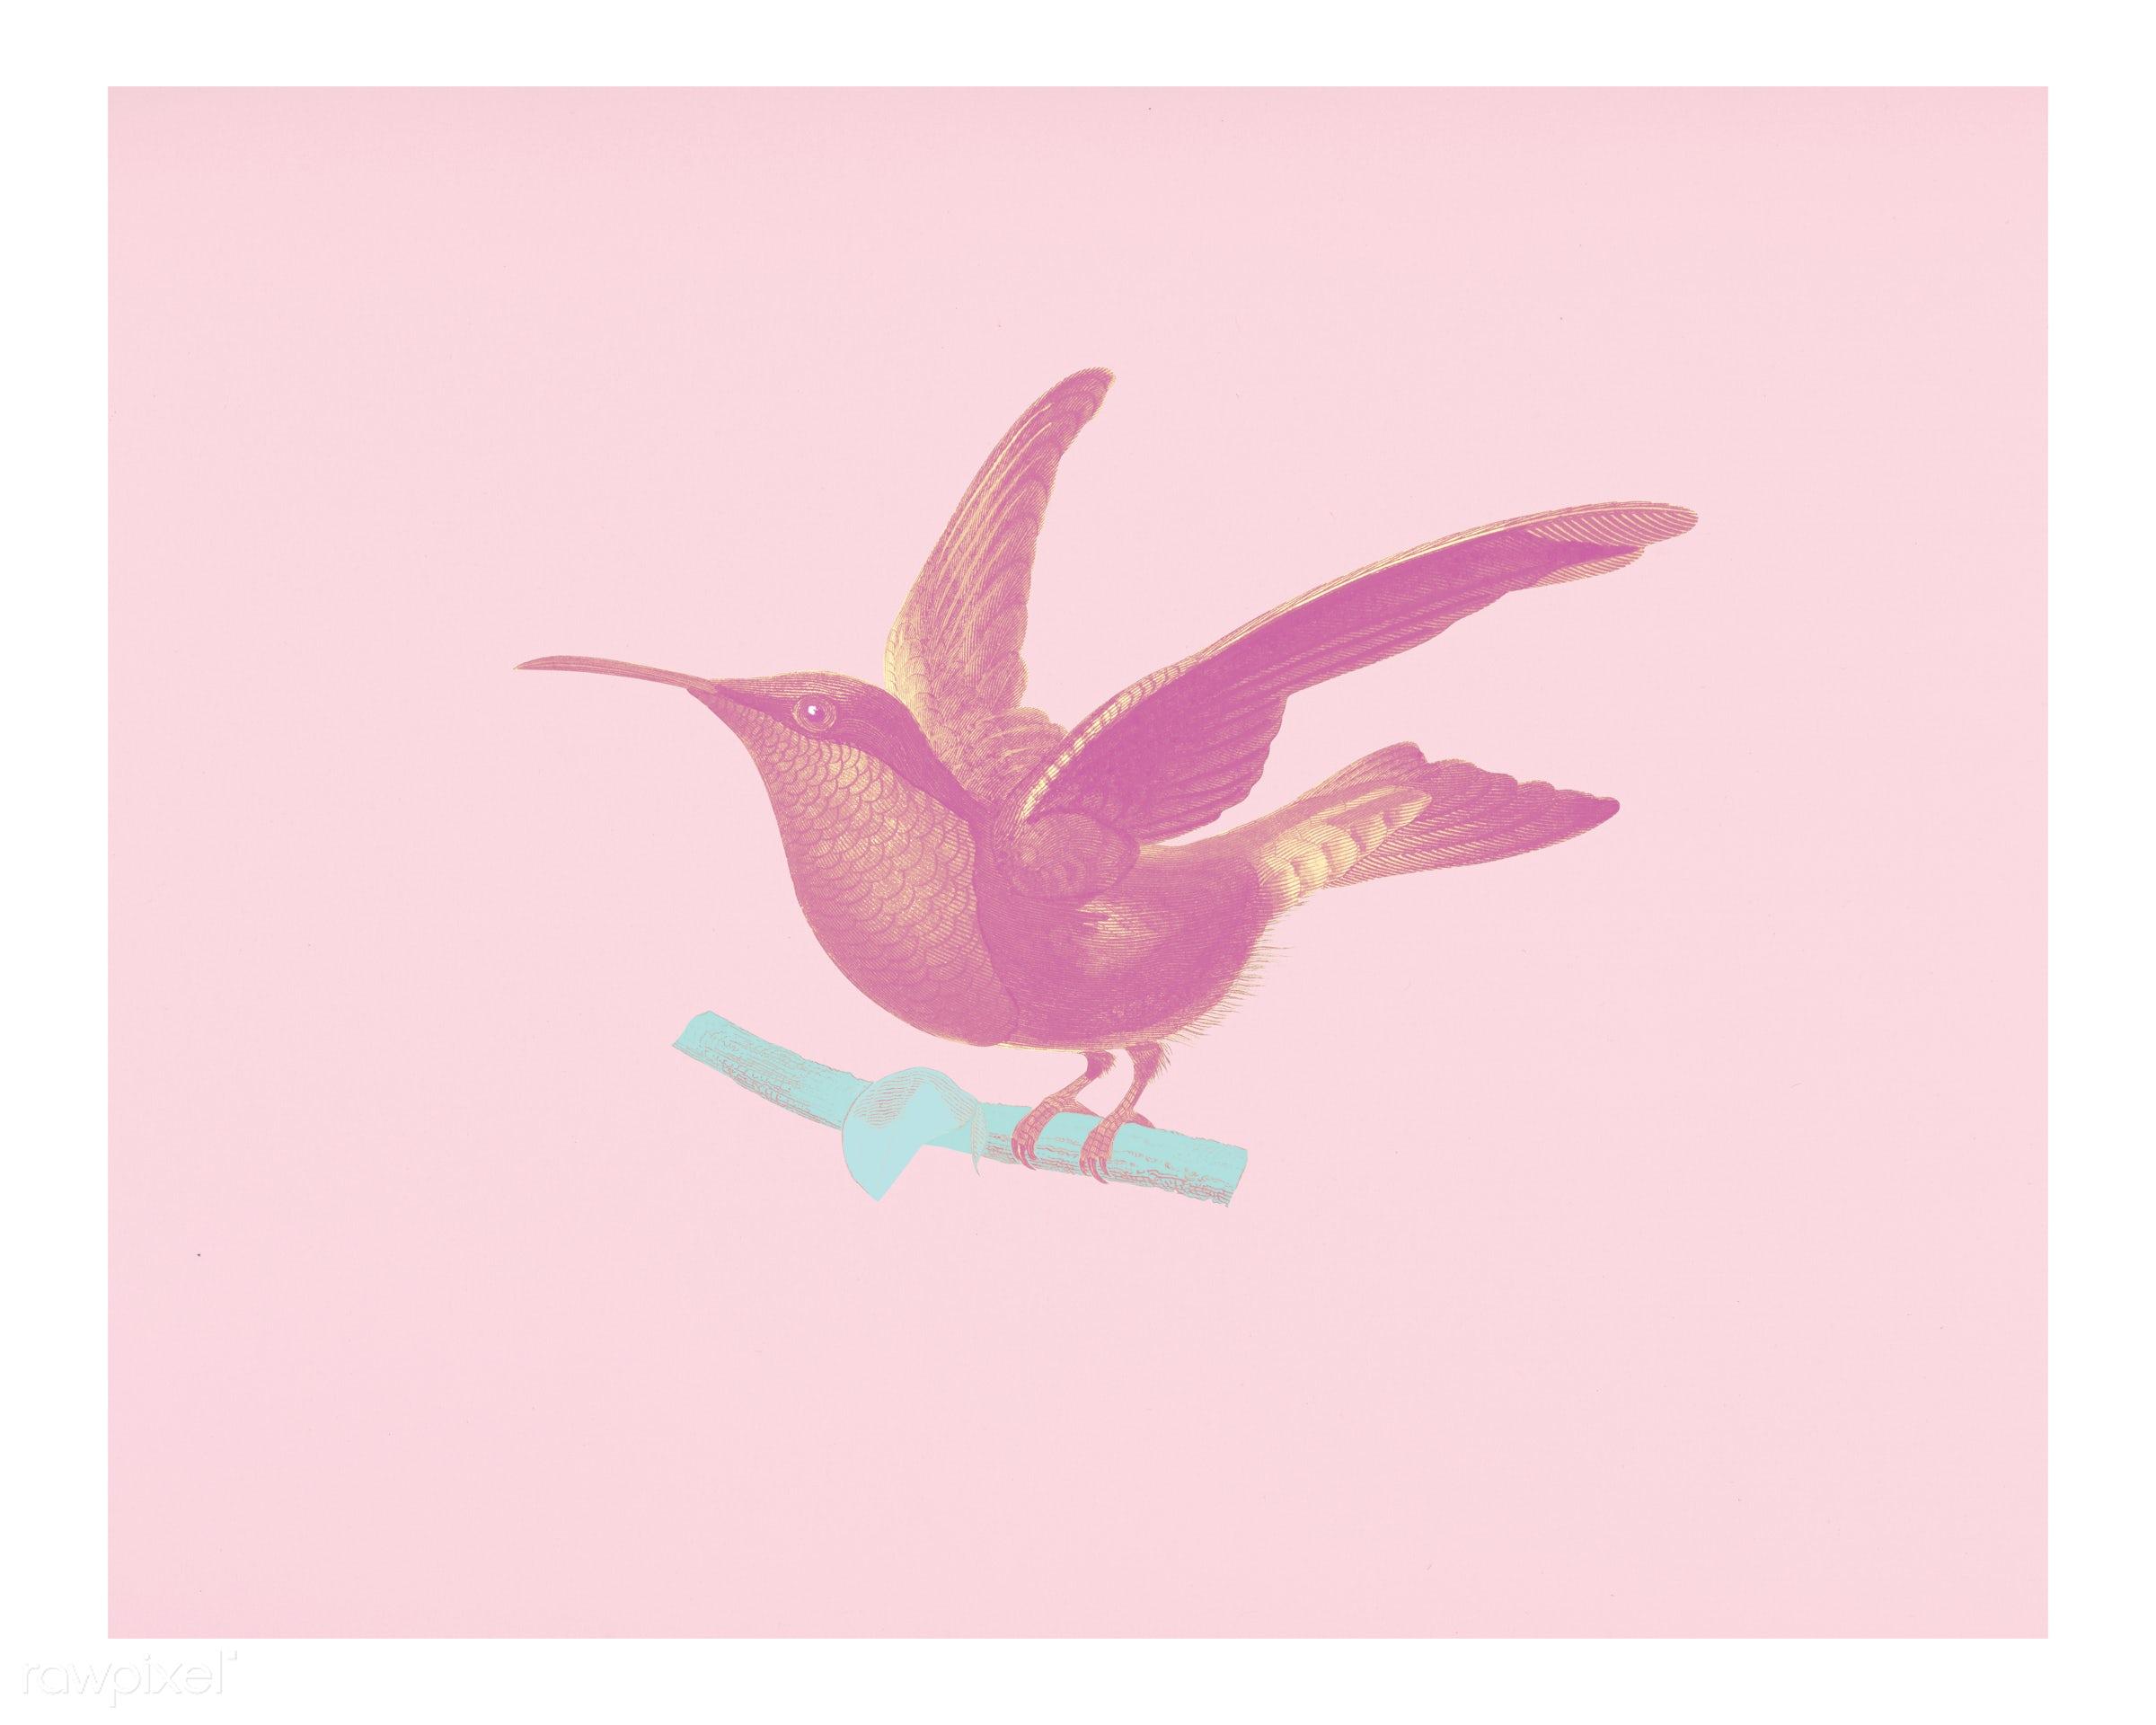 Garnet-throated hummingbird (Trochilus granatinus) illustrated by Charles Dessalines D' Orbigny (1806-1876). Digitally...